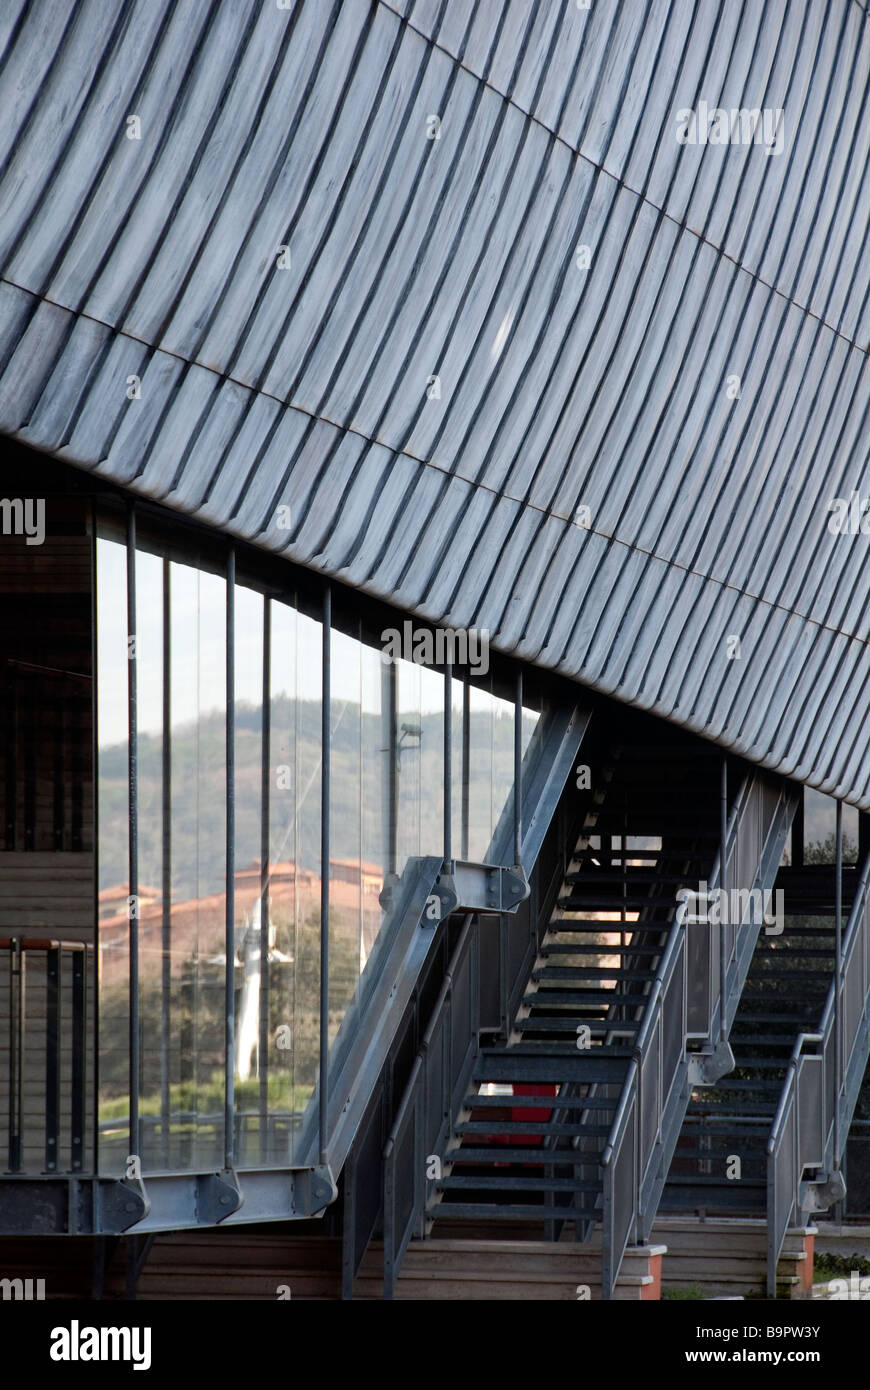 The shells of the new Auditorium Rome designed by leading Italian architect Renzo Piano Stock Photo